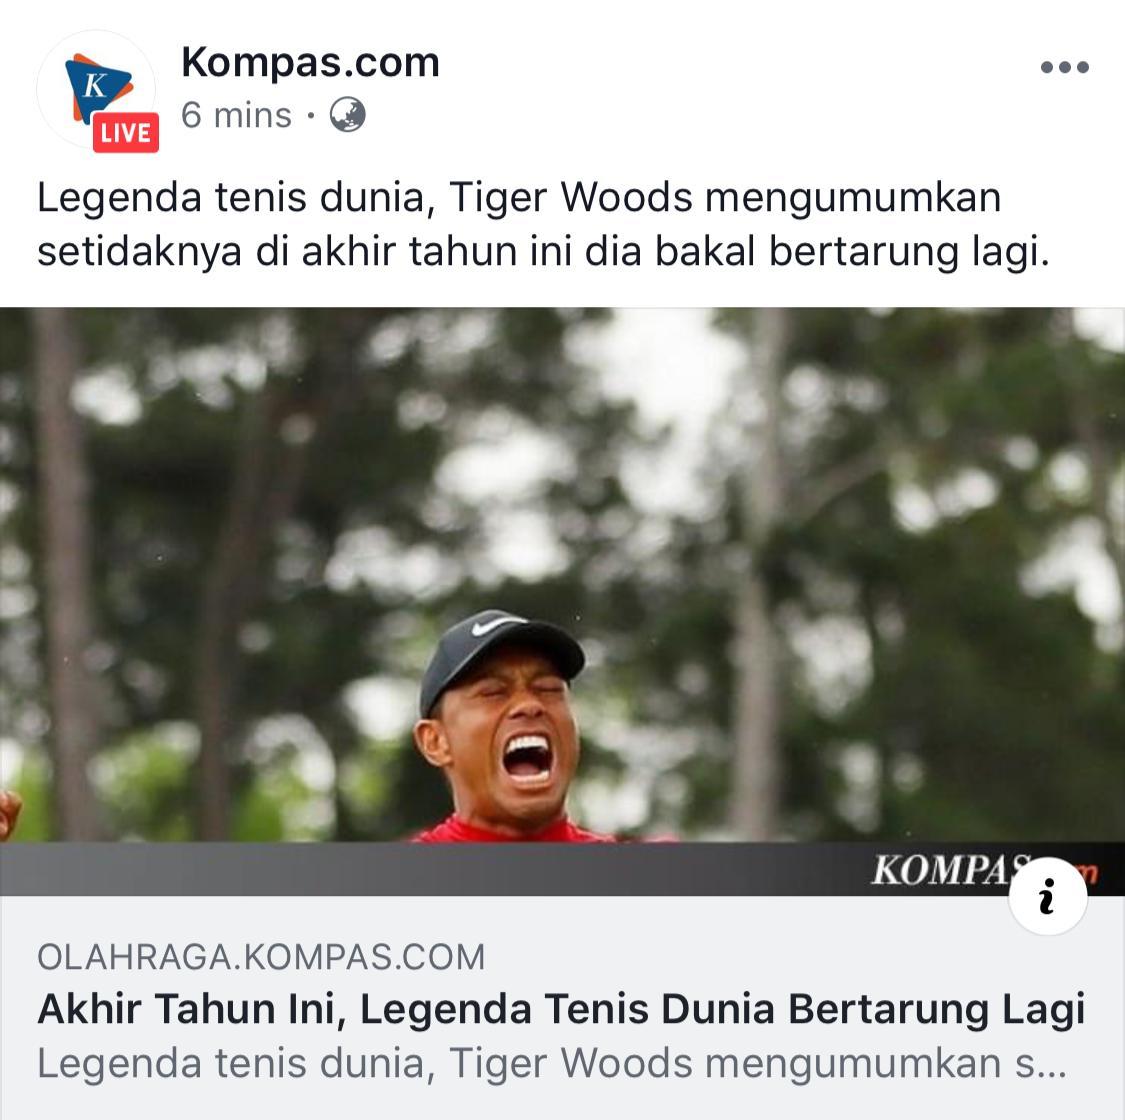 Ngawur! Jelas-jelas Tiger Woods itu atlet senam lantai. olahraga.kompas.com/read/2019/04/2…